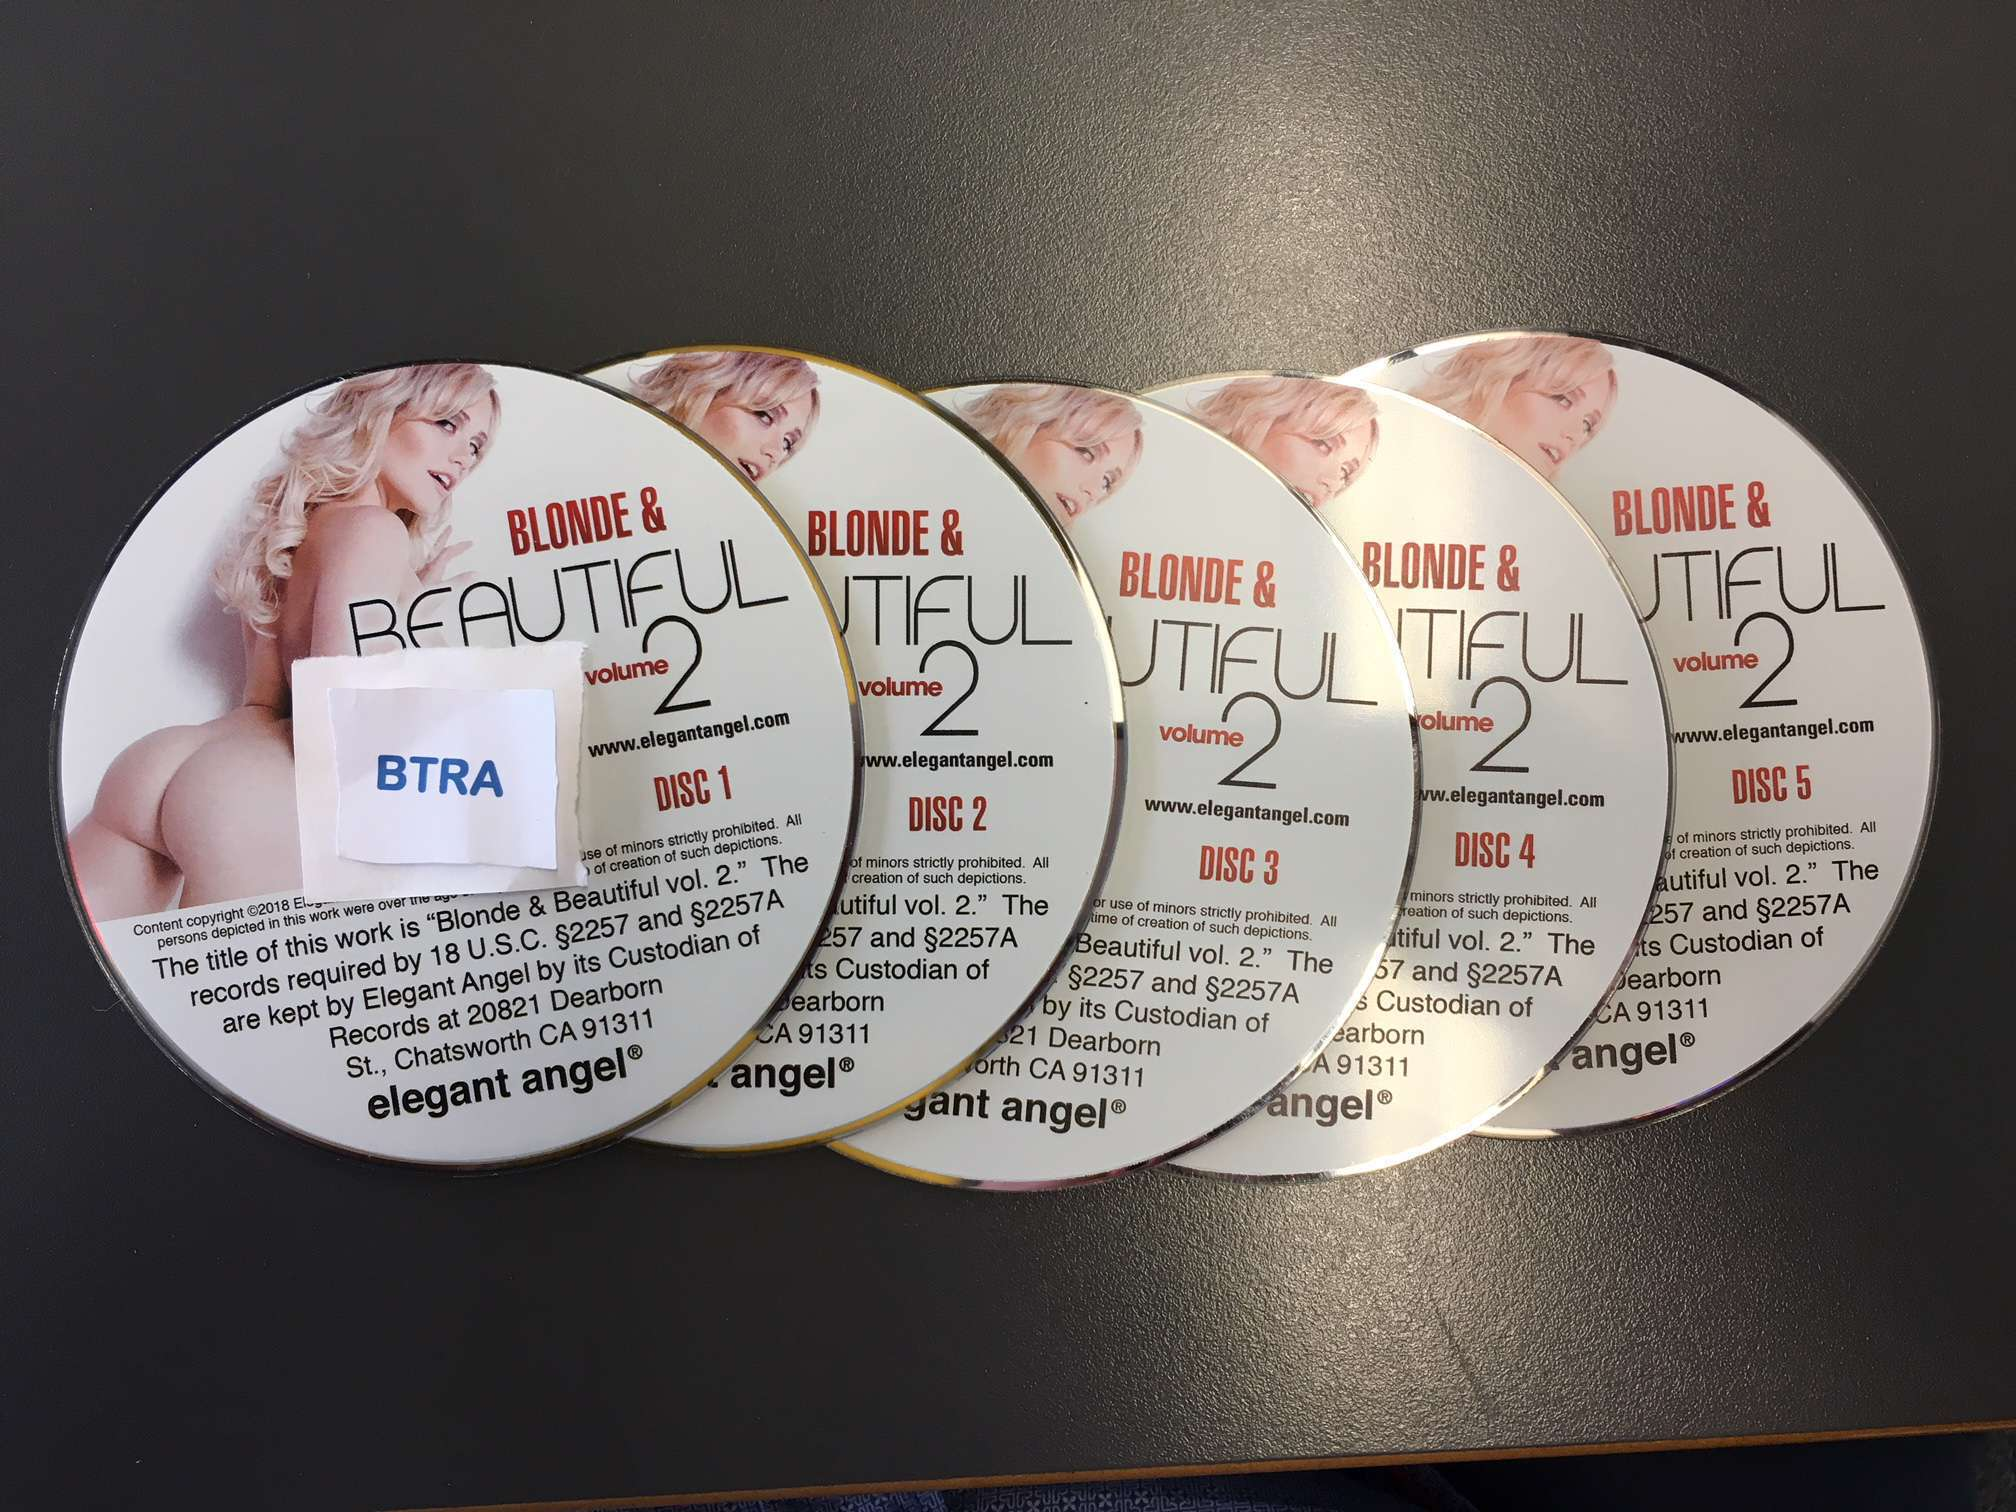 Blond And Beautiful 2 DiSC1 XXX DVDRip x264-BTRA